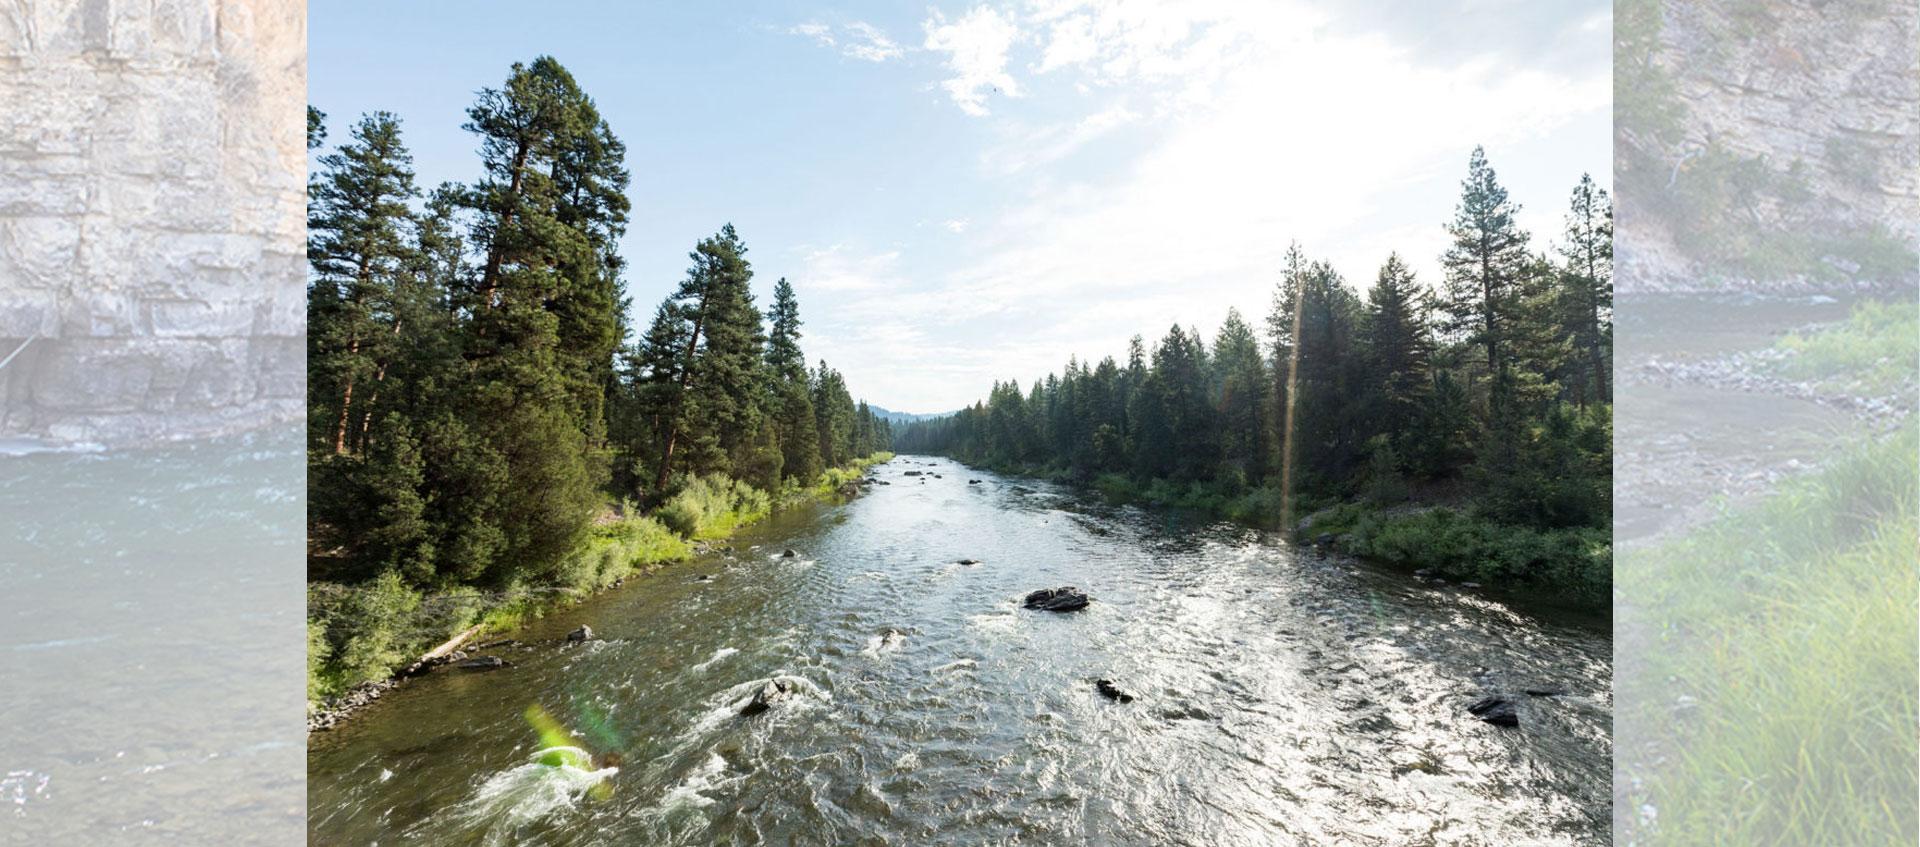 The Blackfoot River in Montana